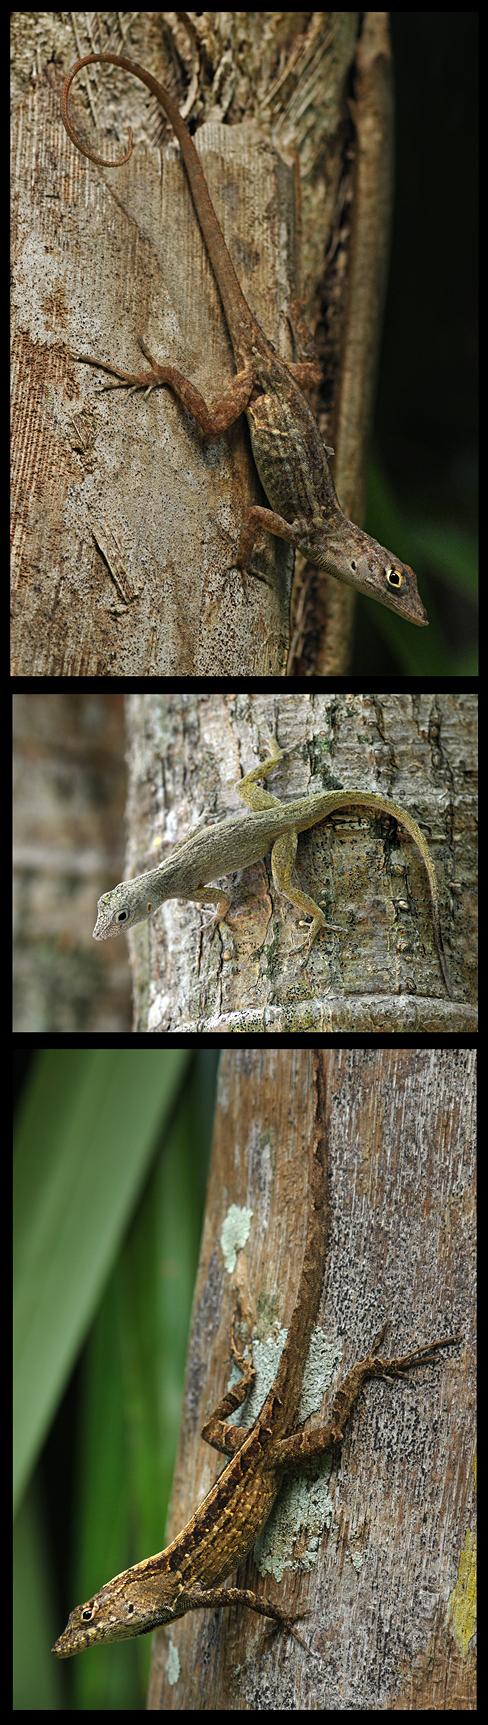 Lizard Camouflage